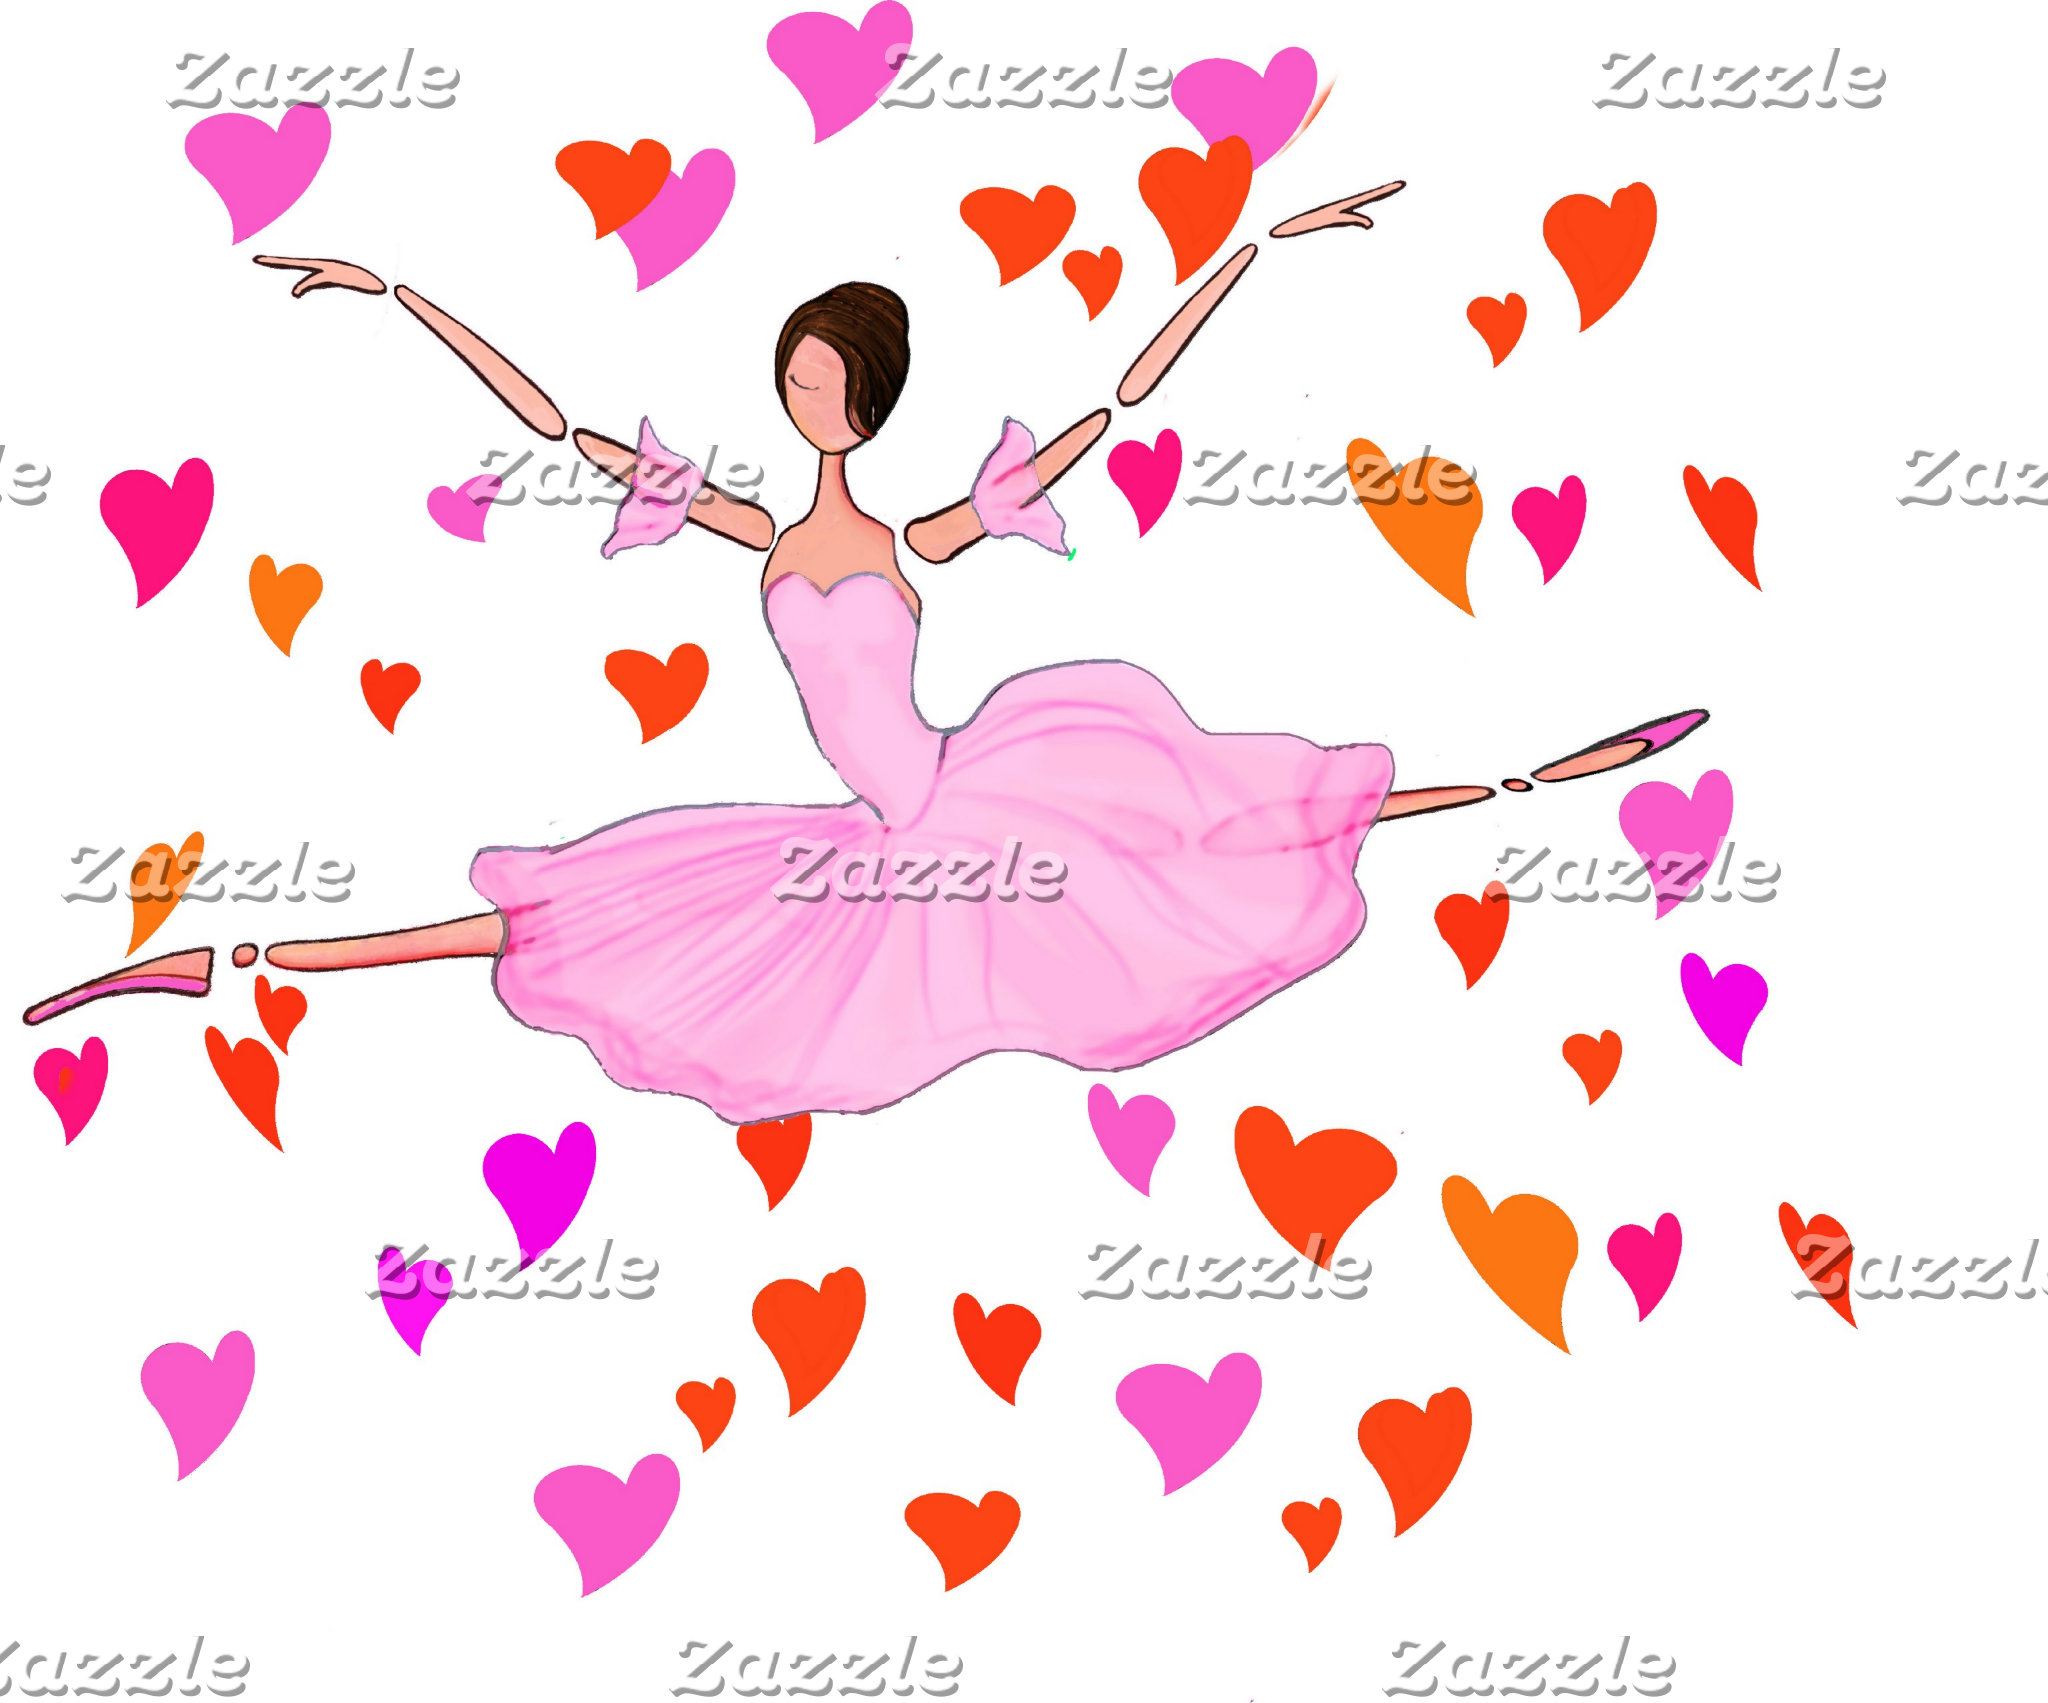 Ballet makes you Jump